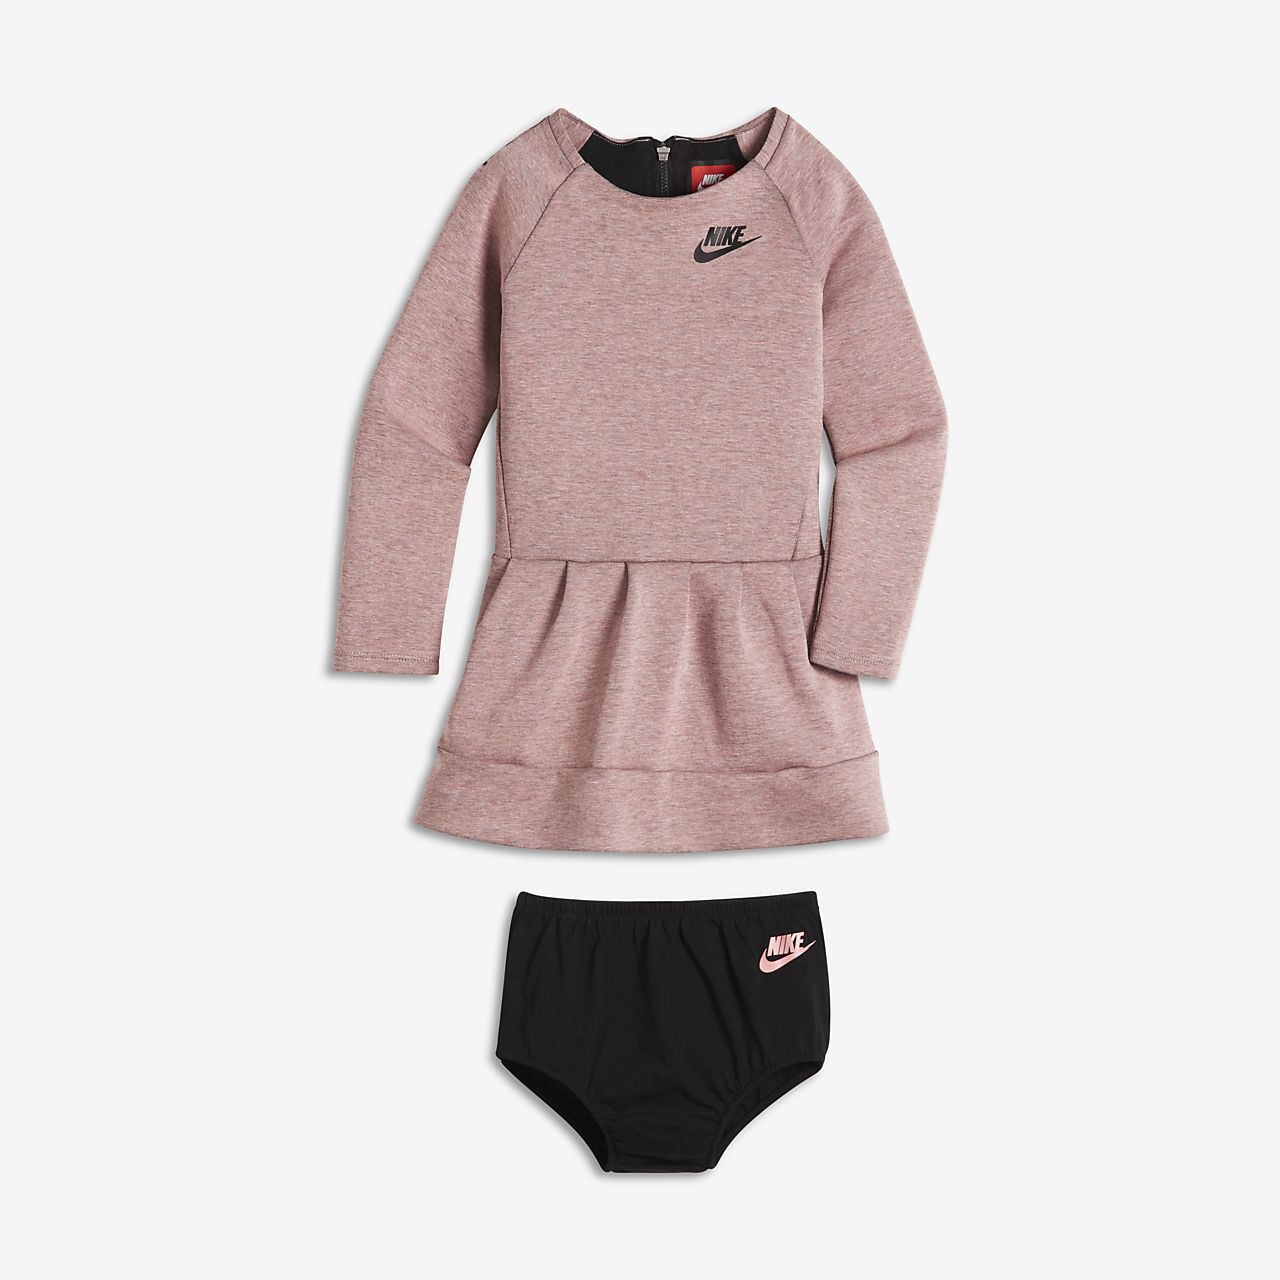 Nike Tech Fleece – pigekjole til babyer/små børn